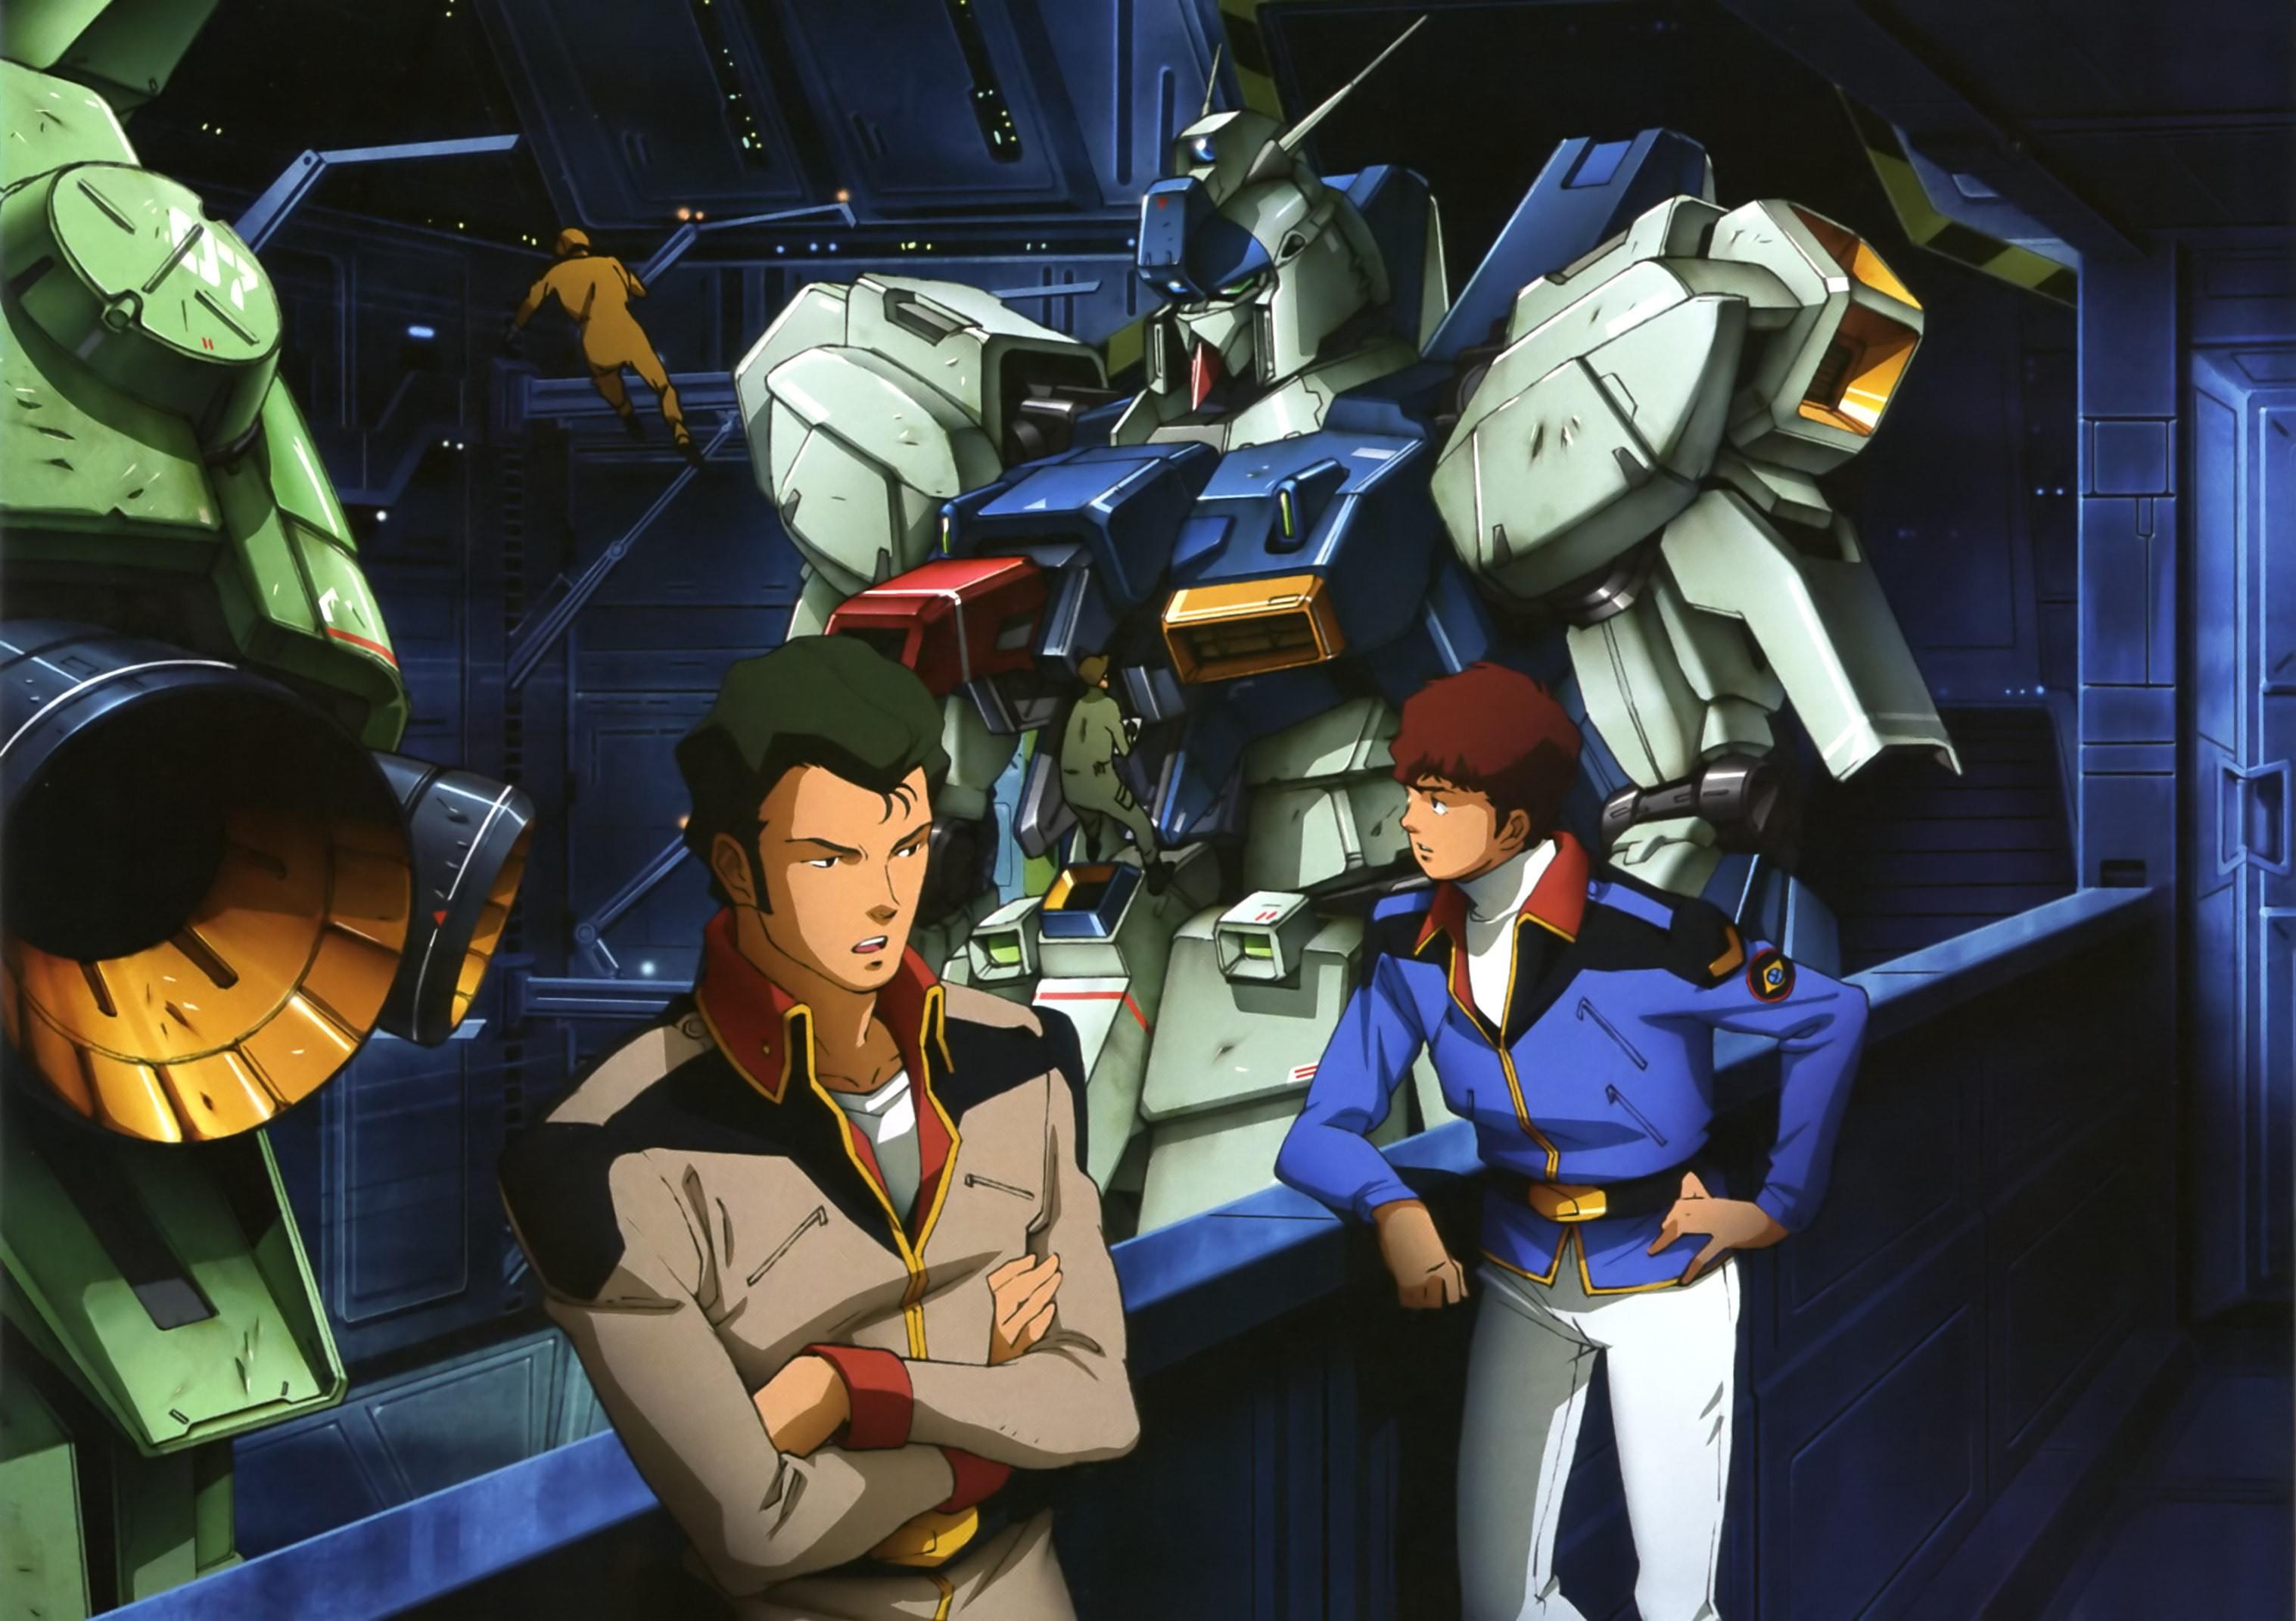 Wallpaper Anime Mobile Suit Gundam Machine Mobile Suit Gundam Char S Counterattack Comics Mobile Suit Games Screenshot Mecha 3034x2142 Wwwyzzerdd 246537 Hd Wallpapers Wallhere